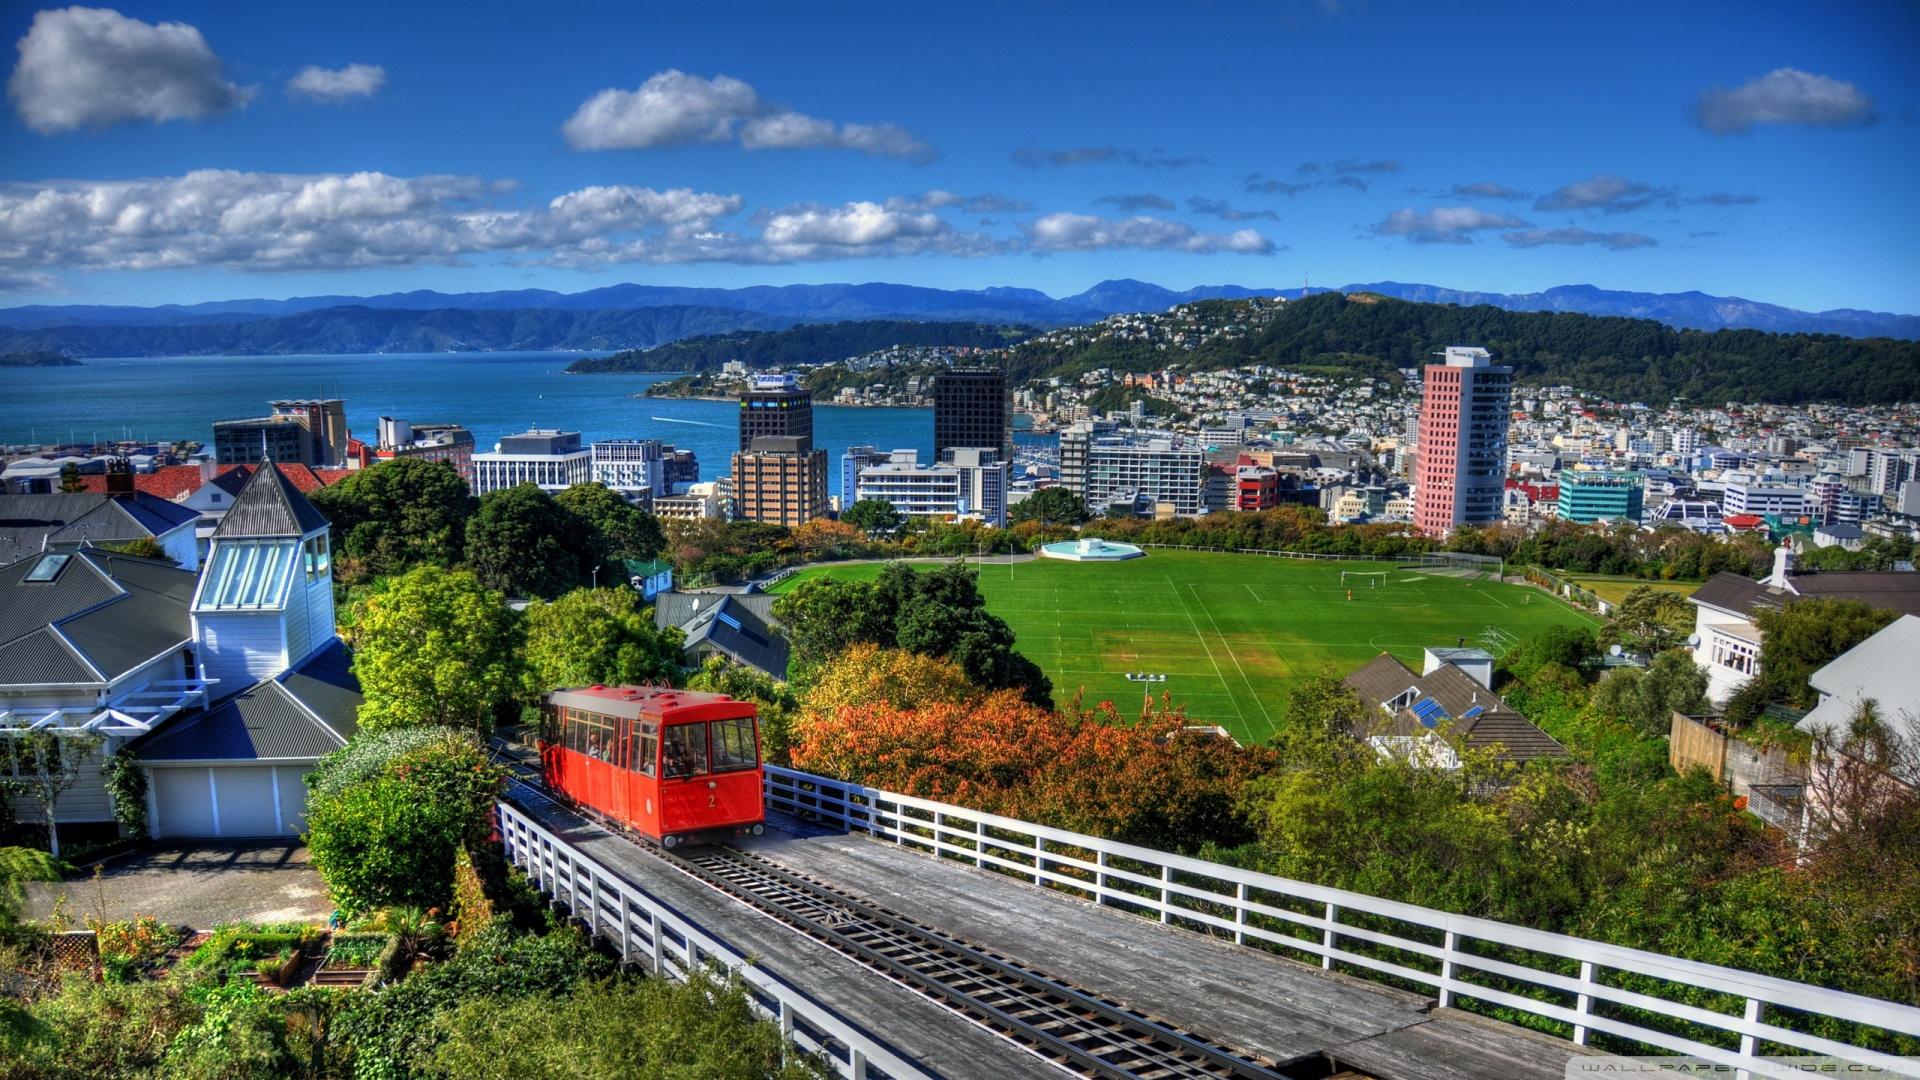 New Zealand Houses Wellington From Above 4K HD Desktop 1920x1080